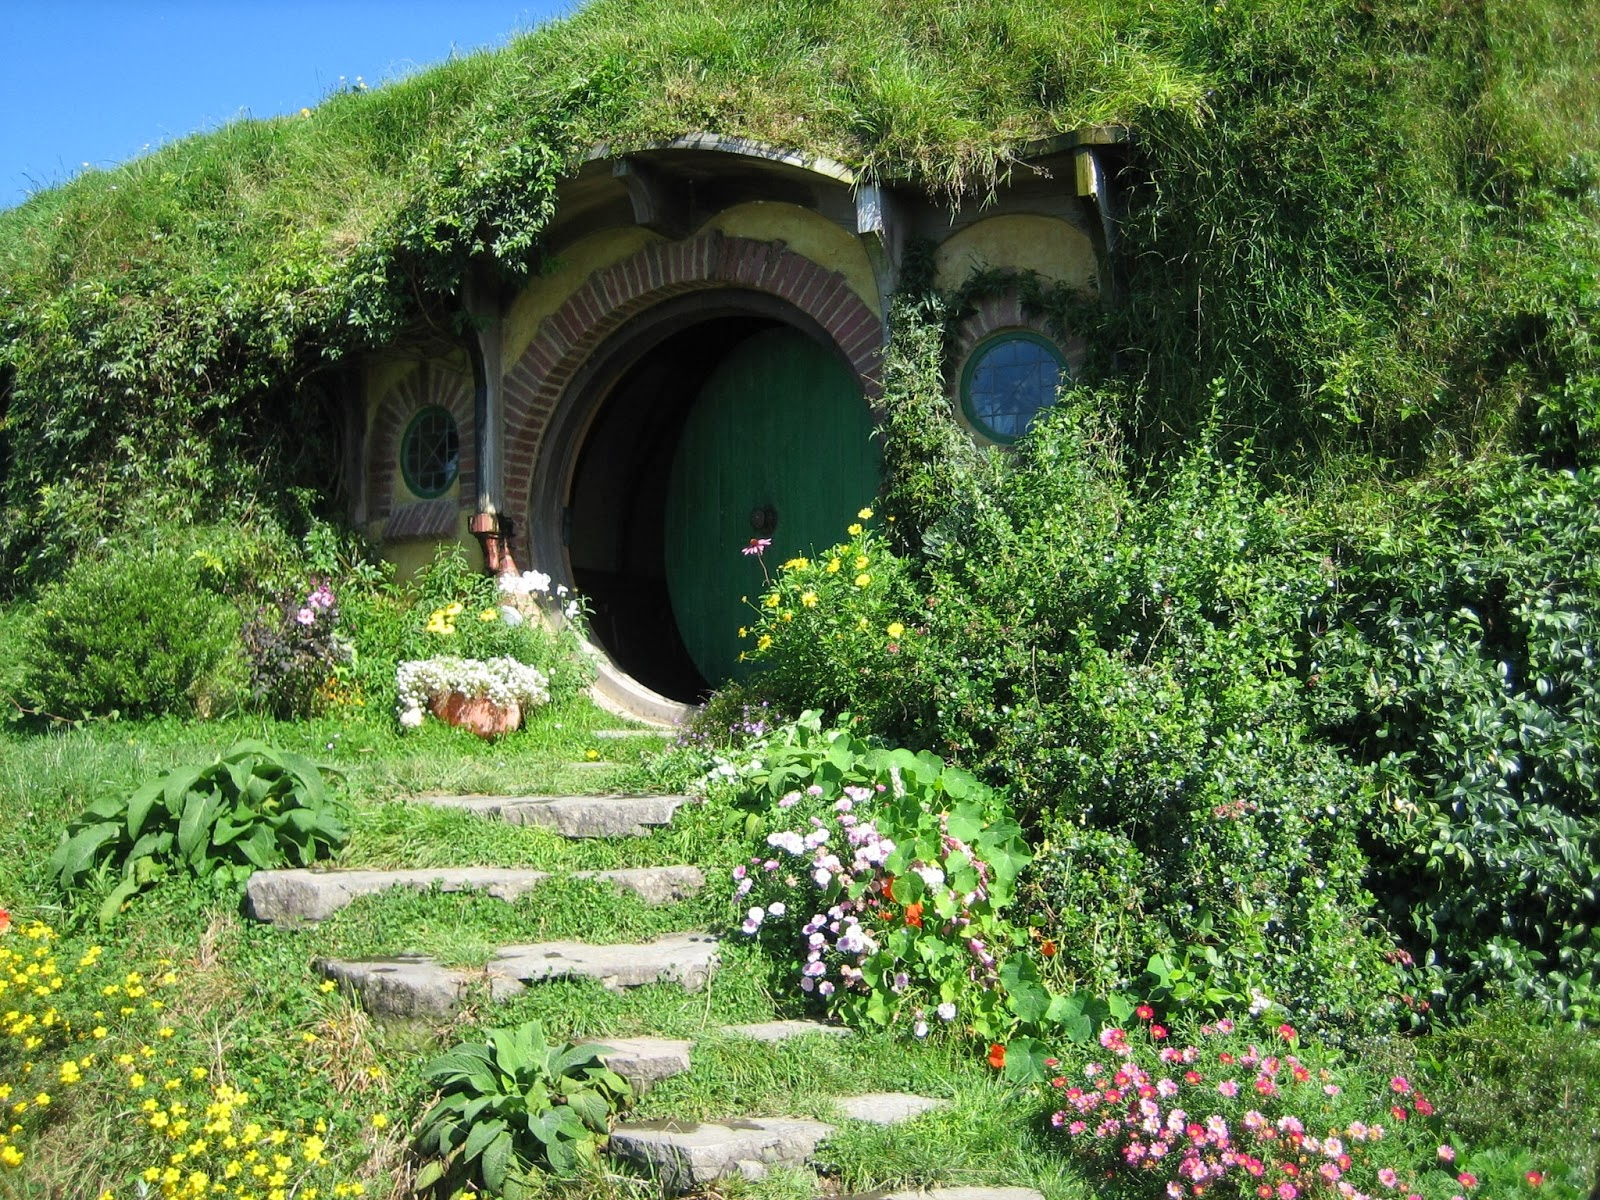 Construire sa maison de hobbit maison moderne for Construire une maison de hobbit